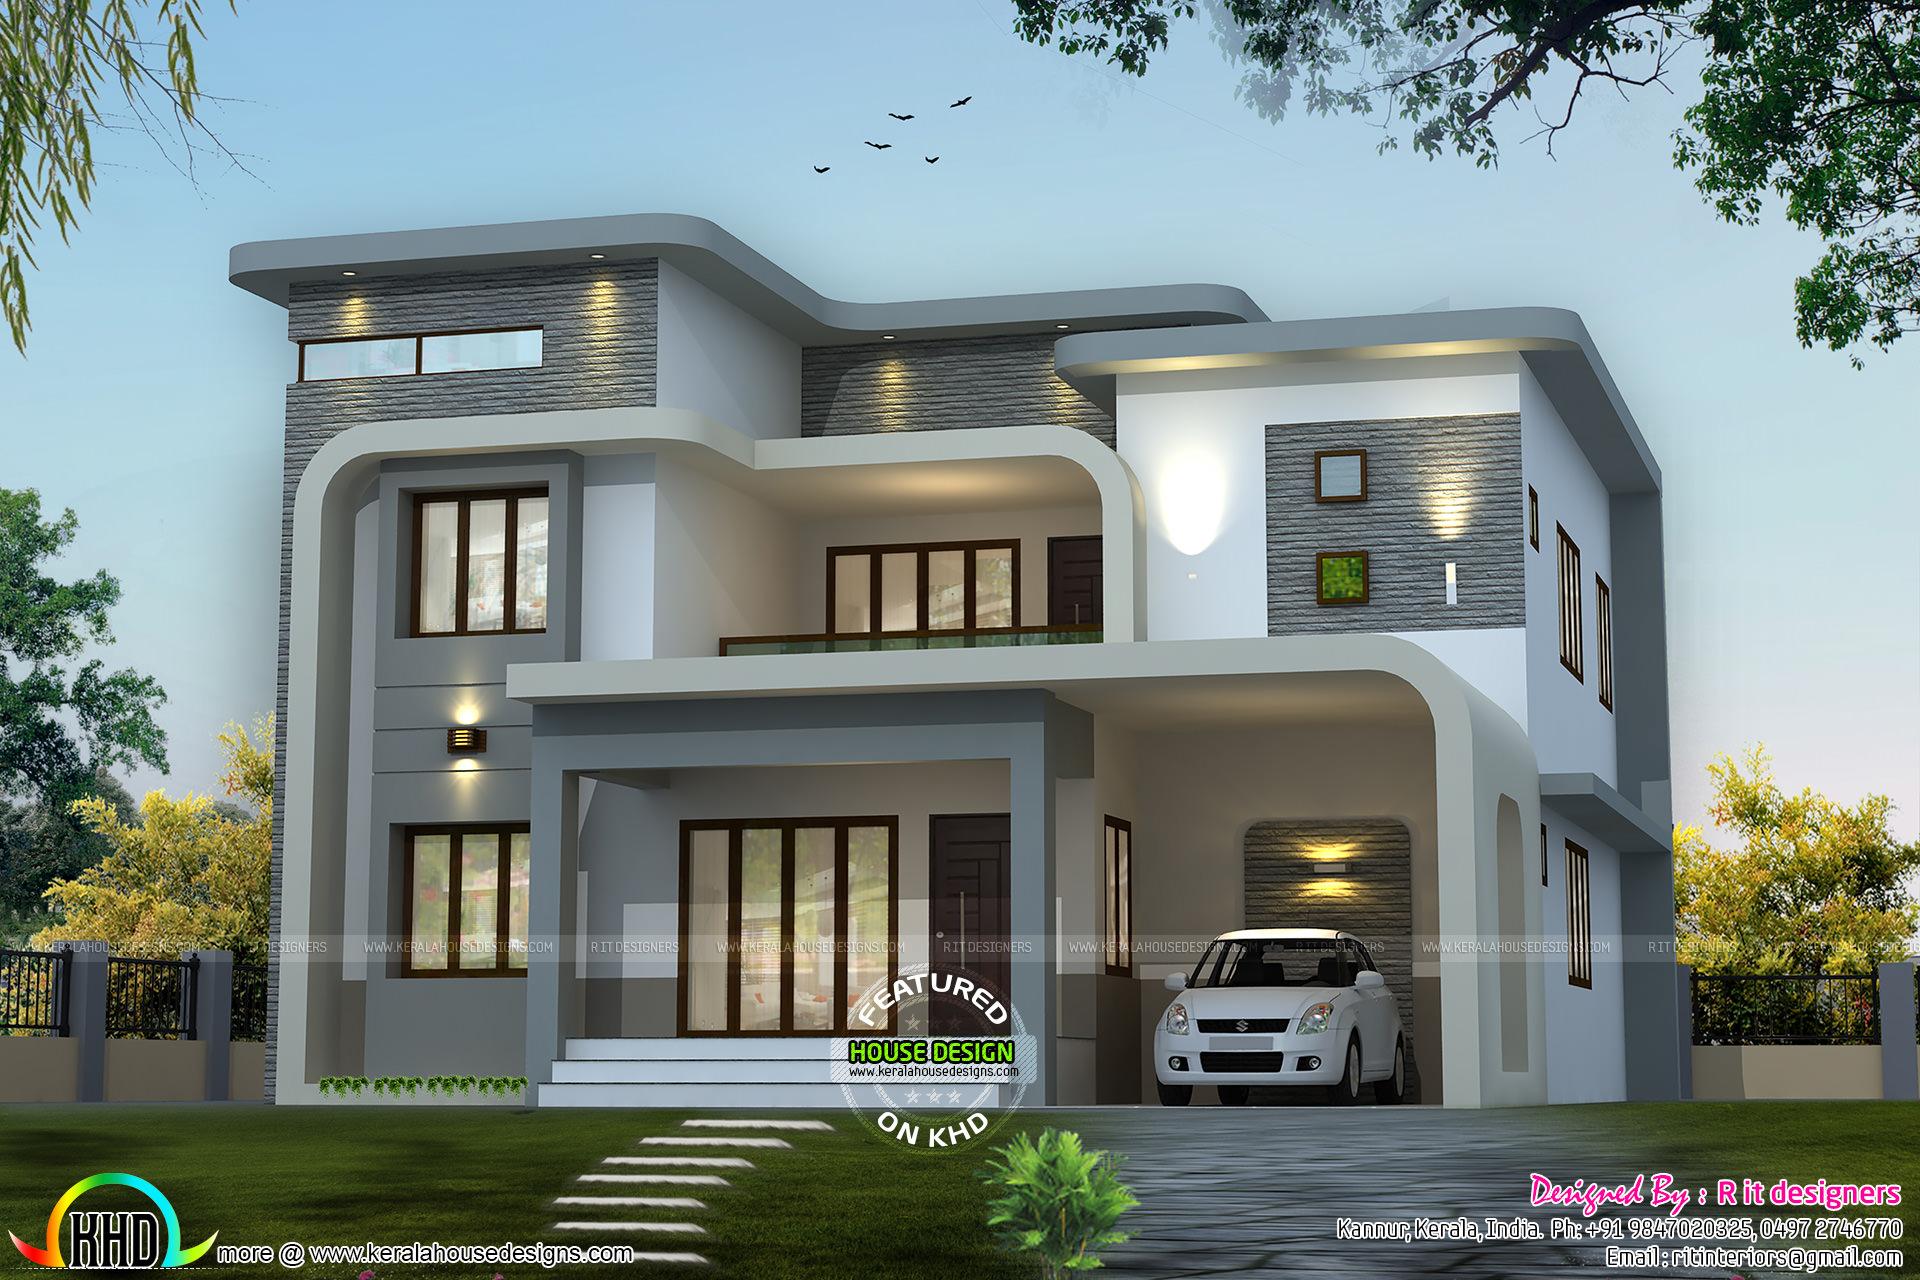 unique flowing home design - 1955 Home Design